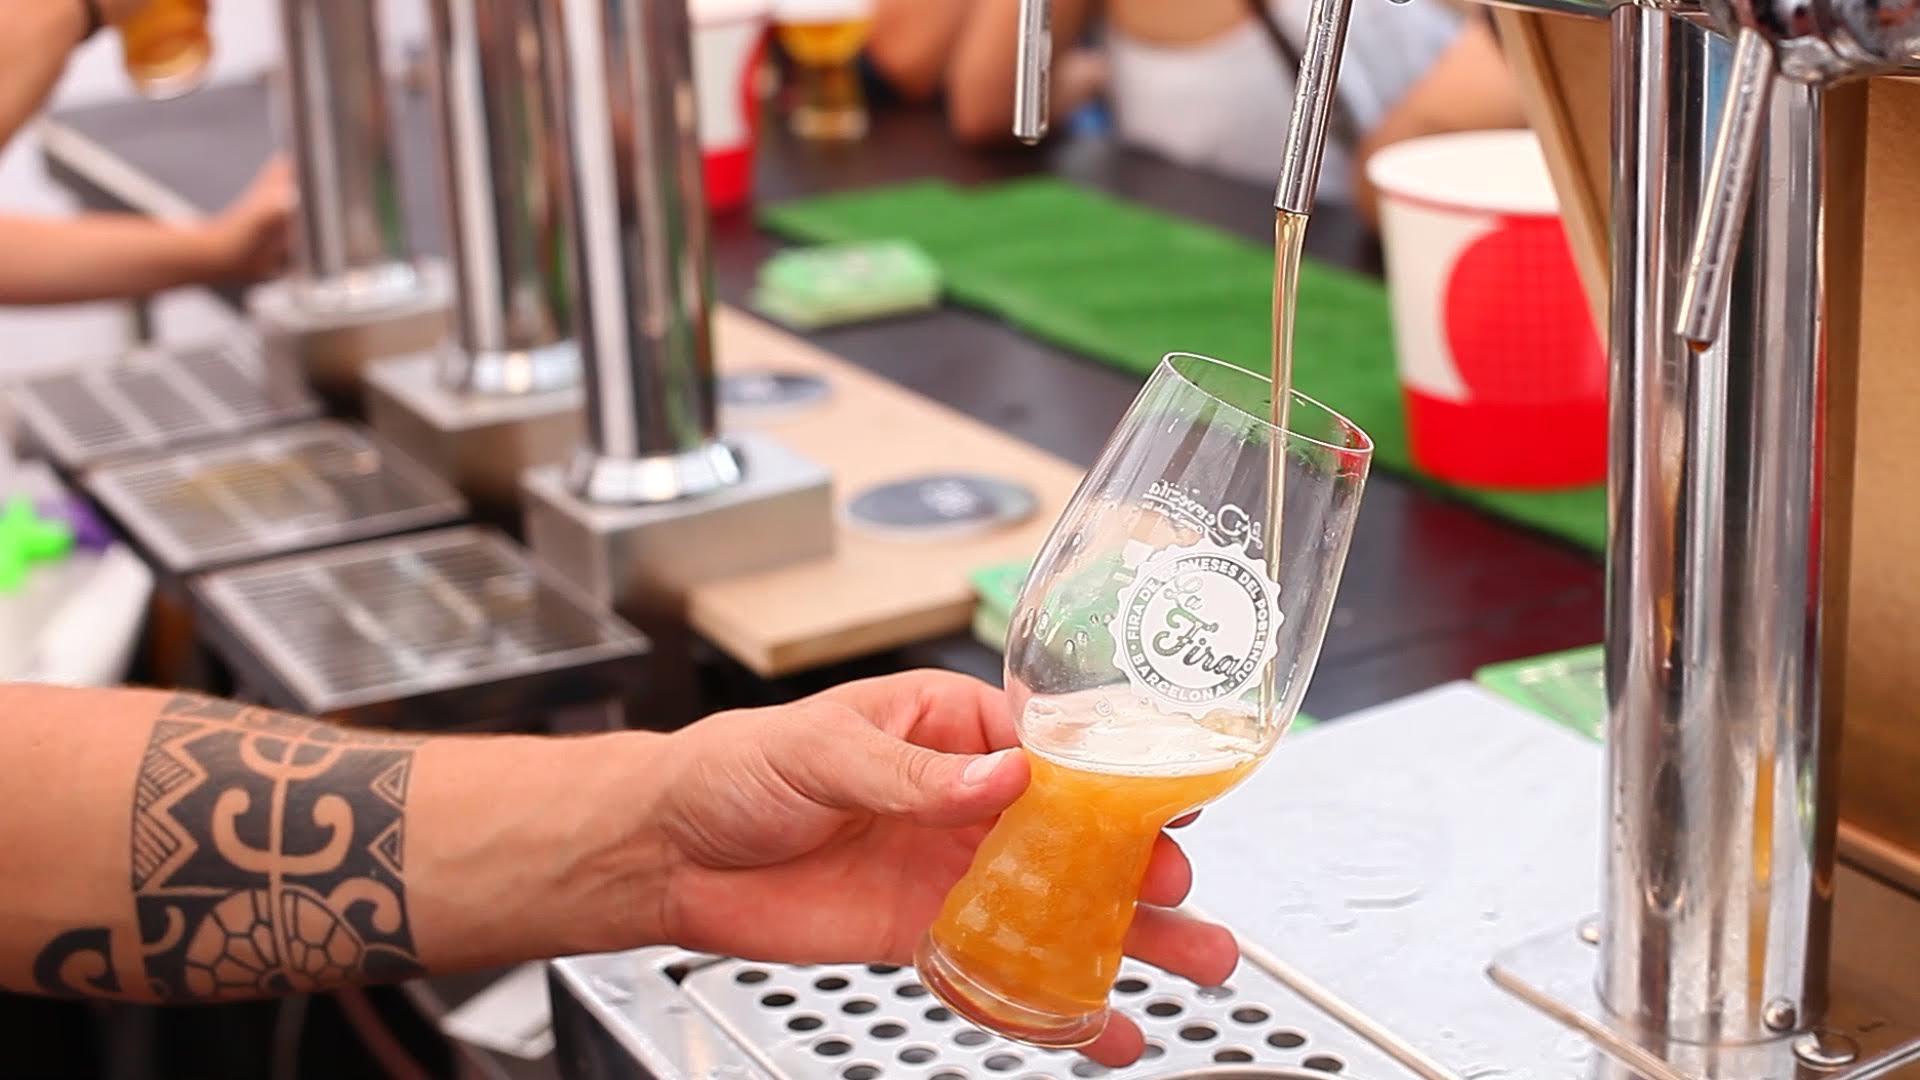 V Fira de Cerveses Artesanes del Poblenou